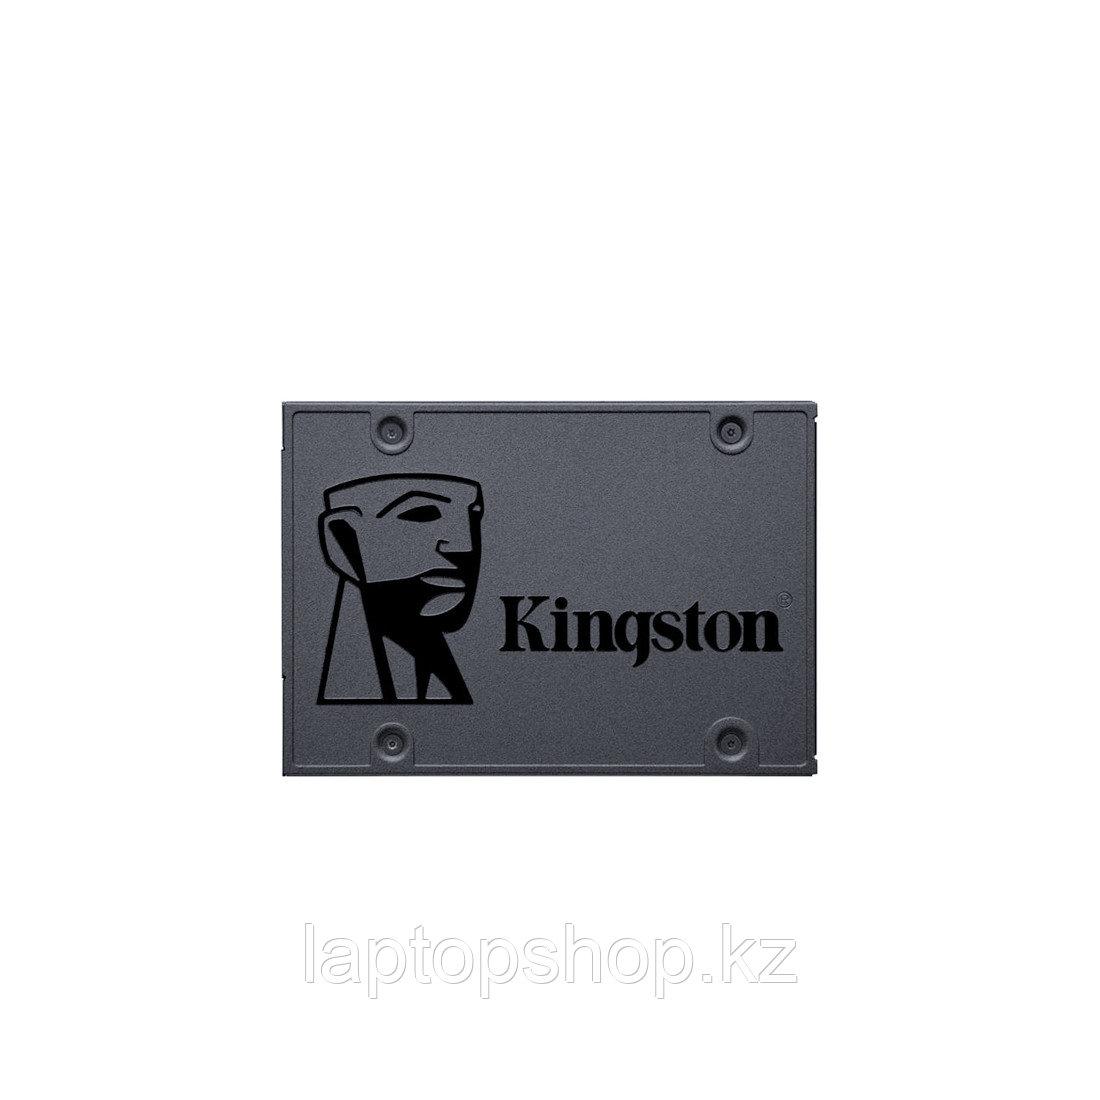 Kingston SSD 120 Gb SA400S37/120G, Sata 6Gb/s